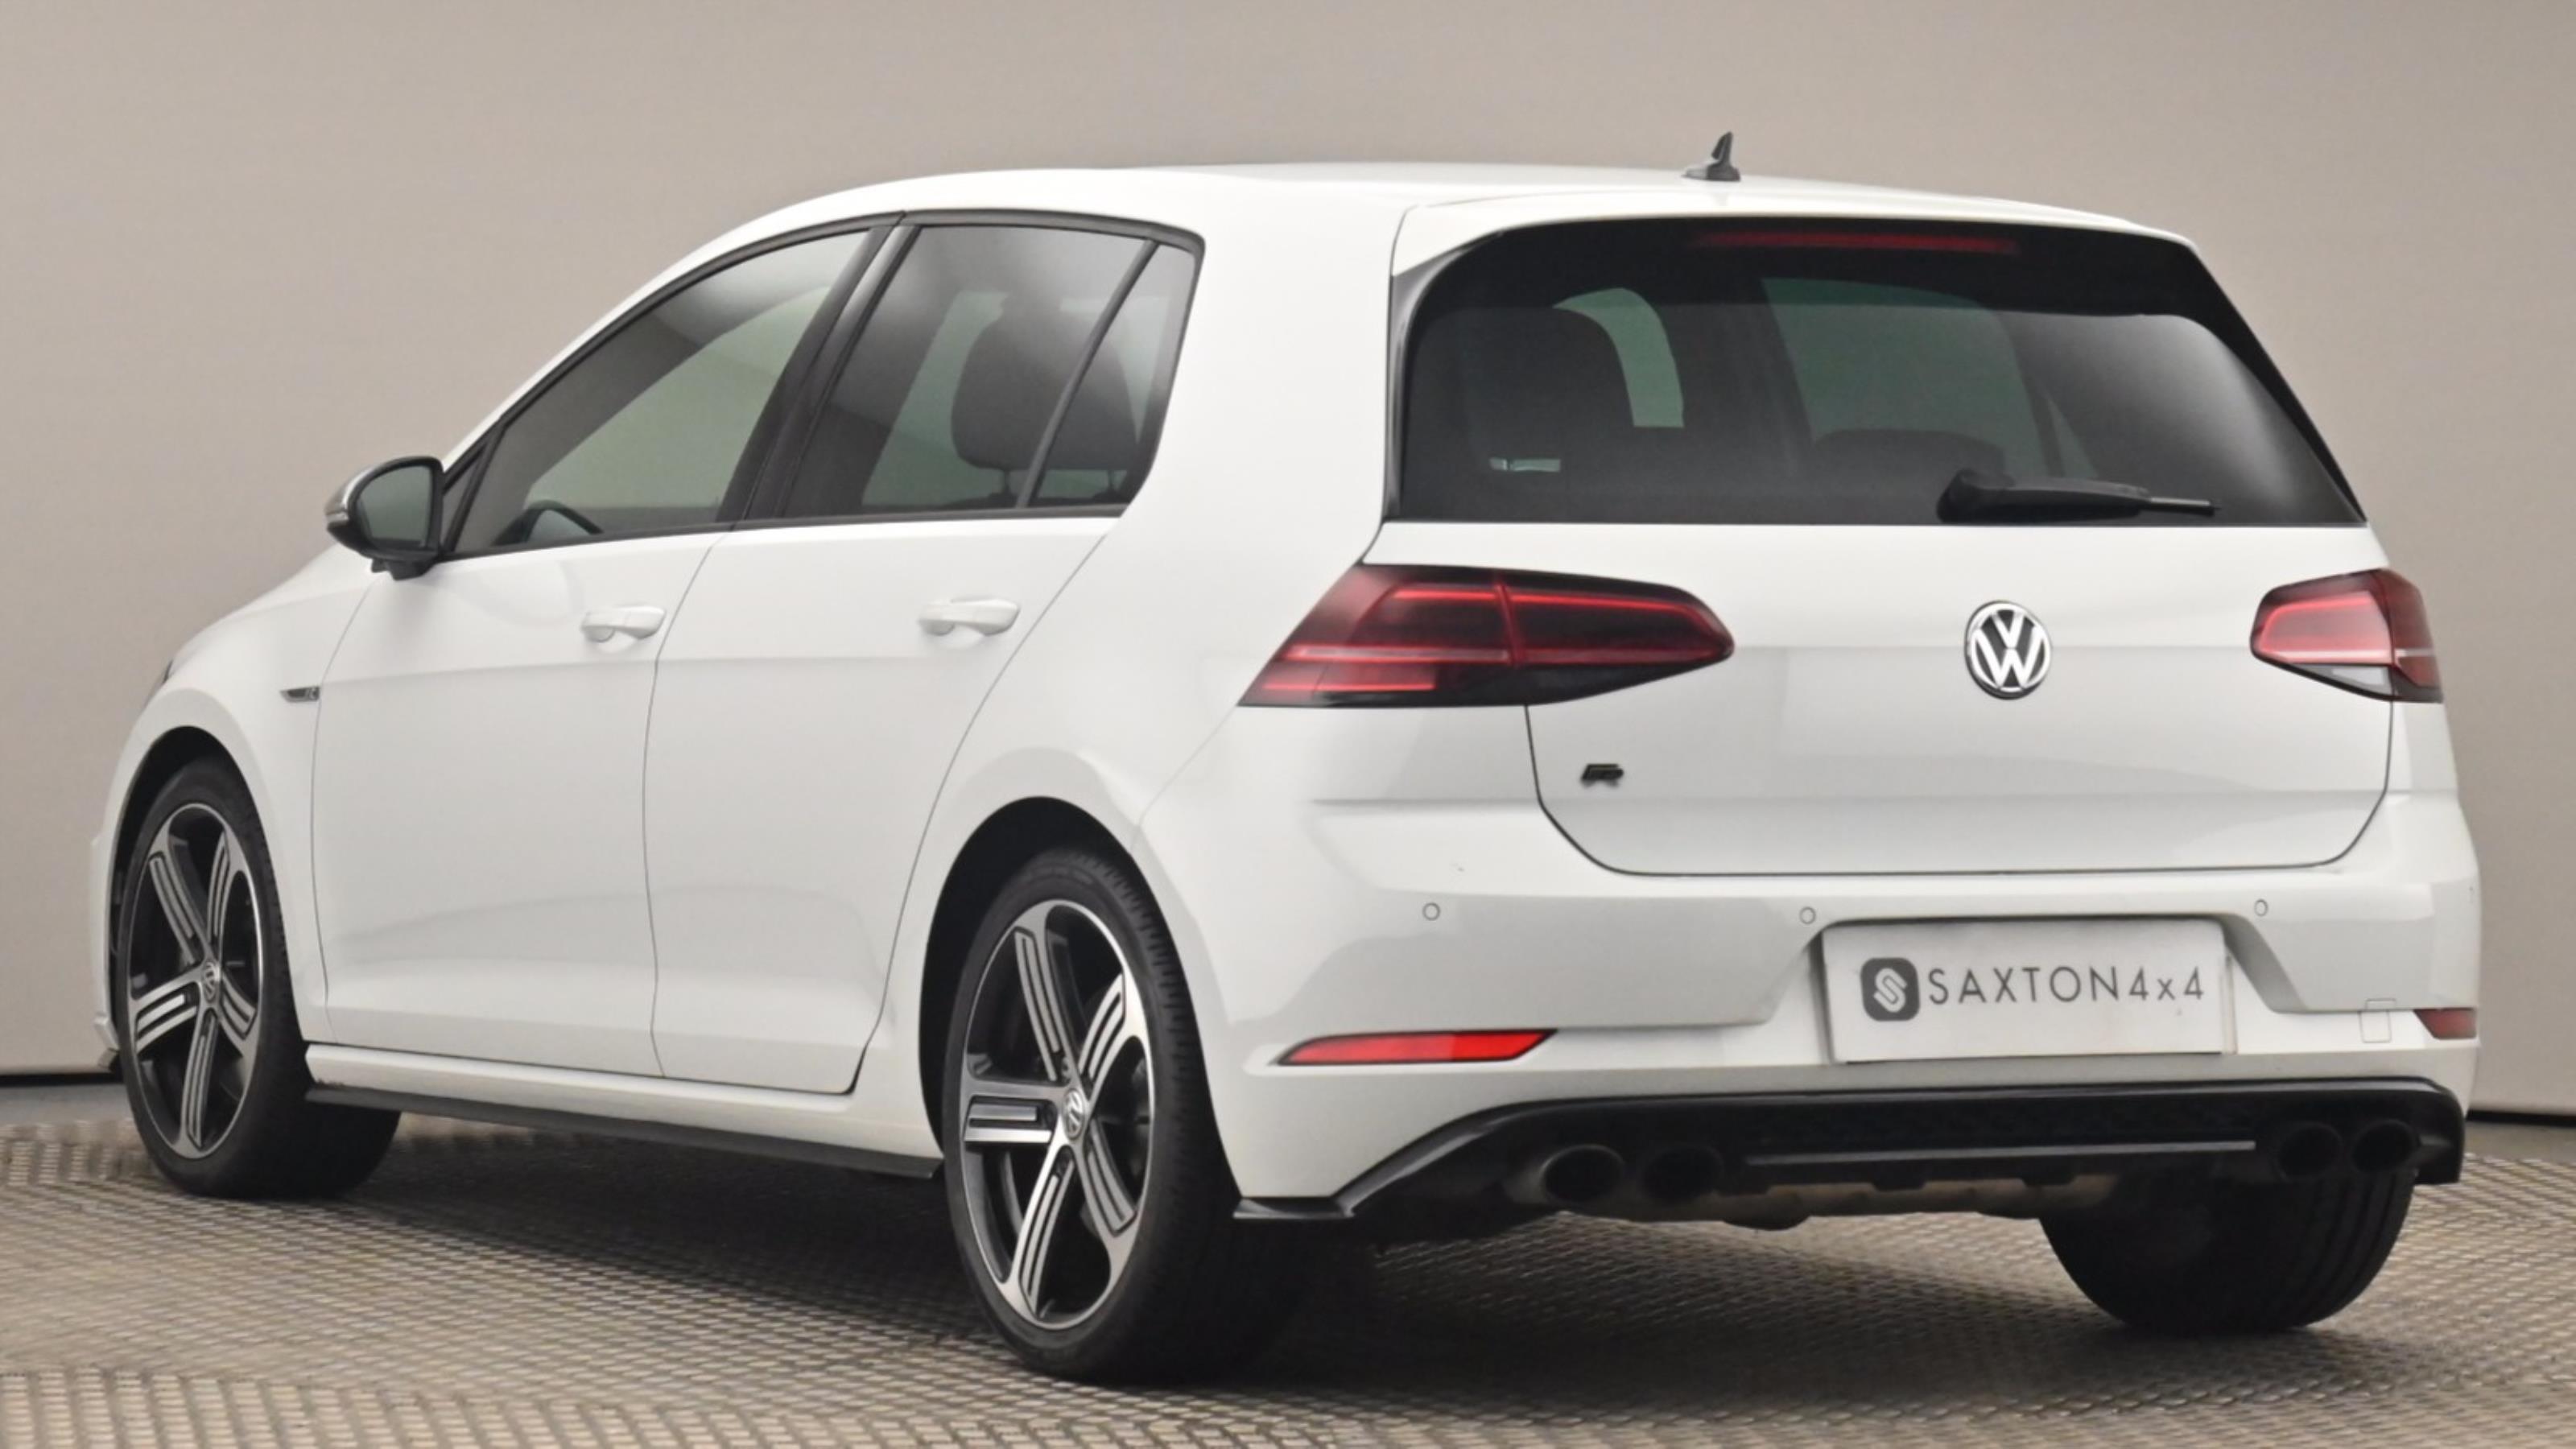 Used 2018 Volkswagen GOLF 2.0 TSI 310 R 5dr 4MOTION DSG White at Saxton4x4